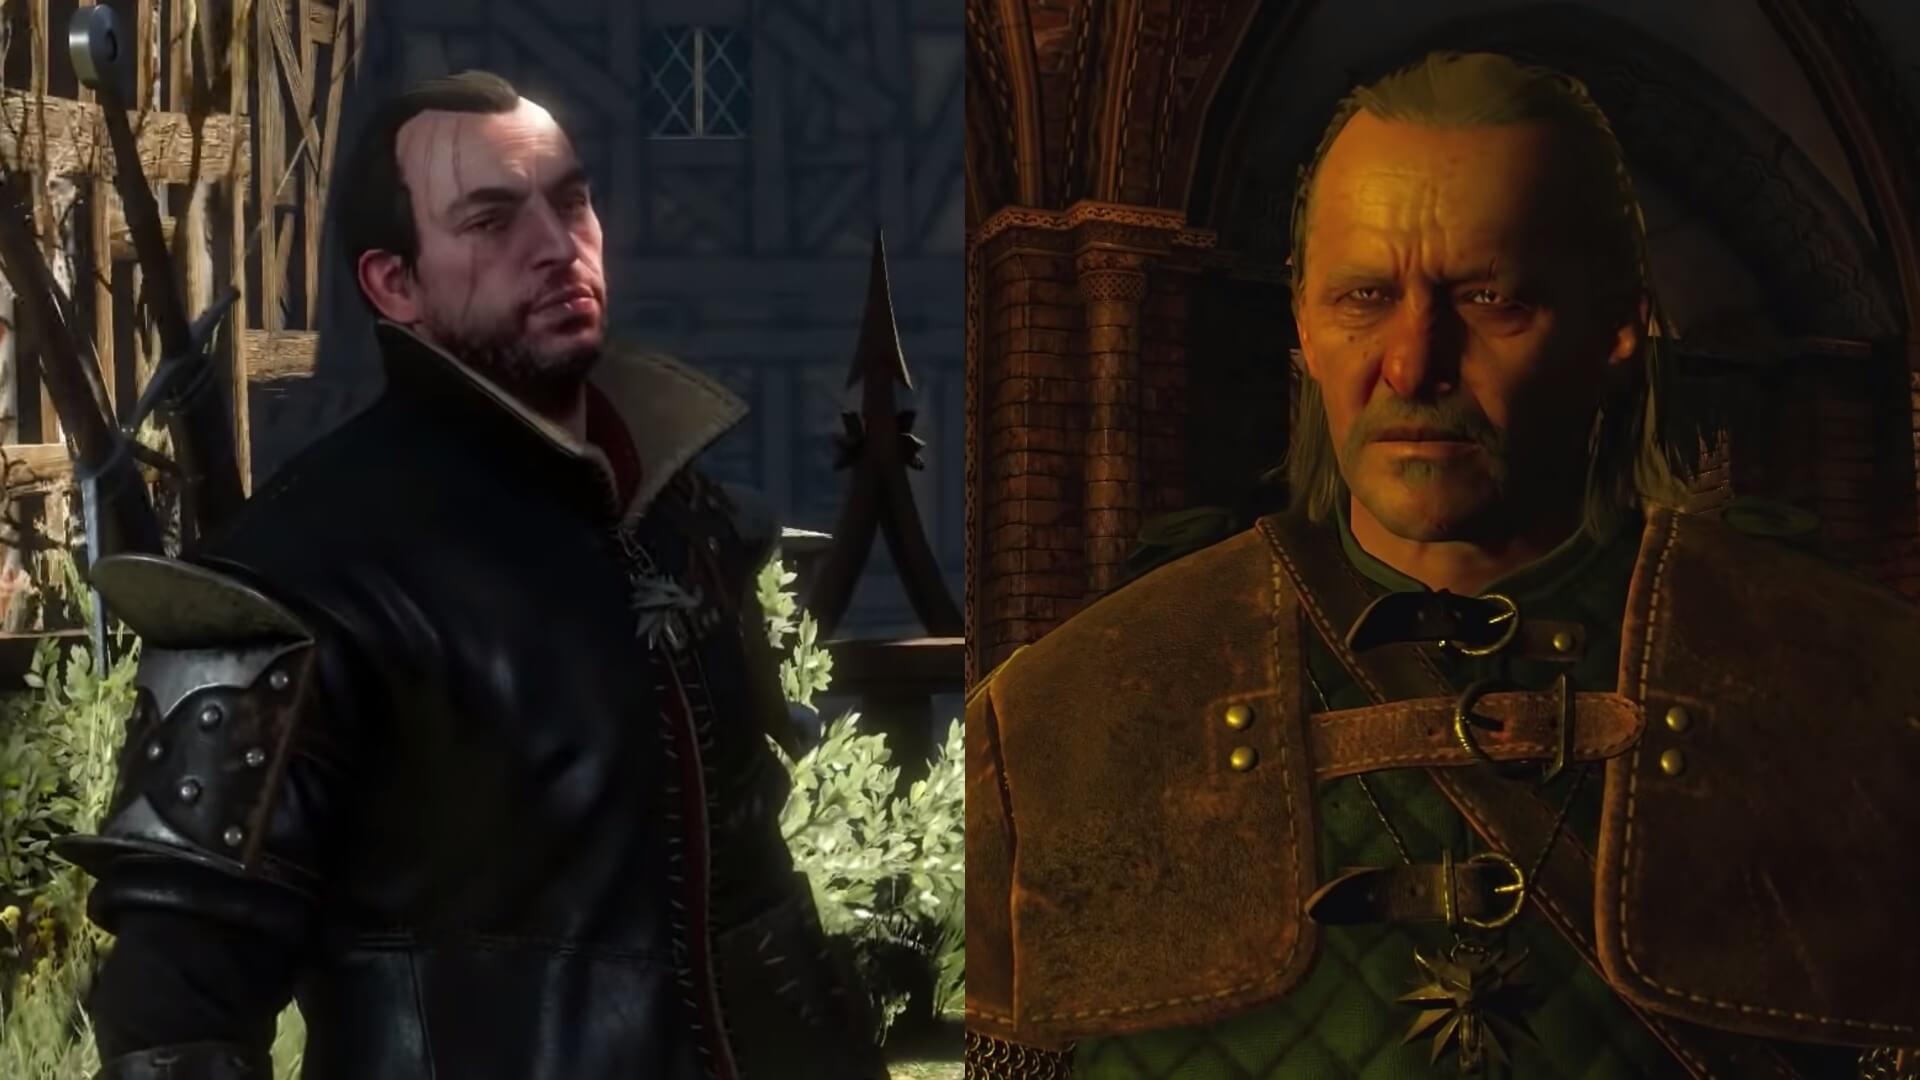 Geralt - Lambert and Vesemir